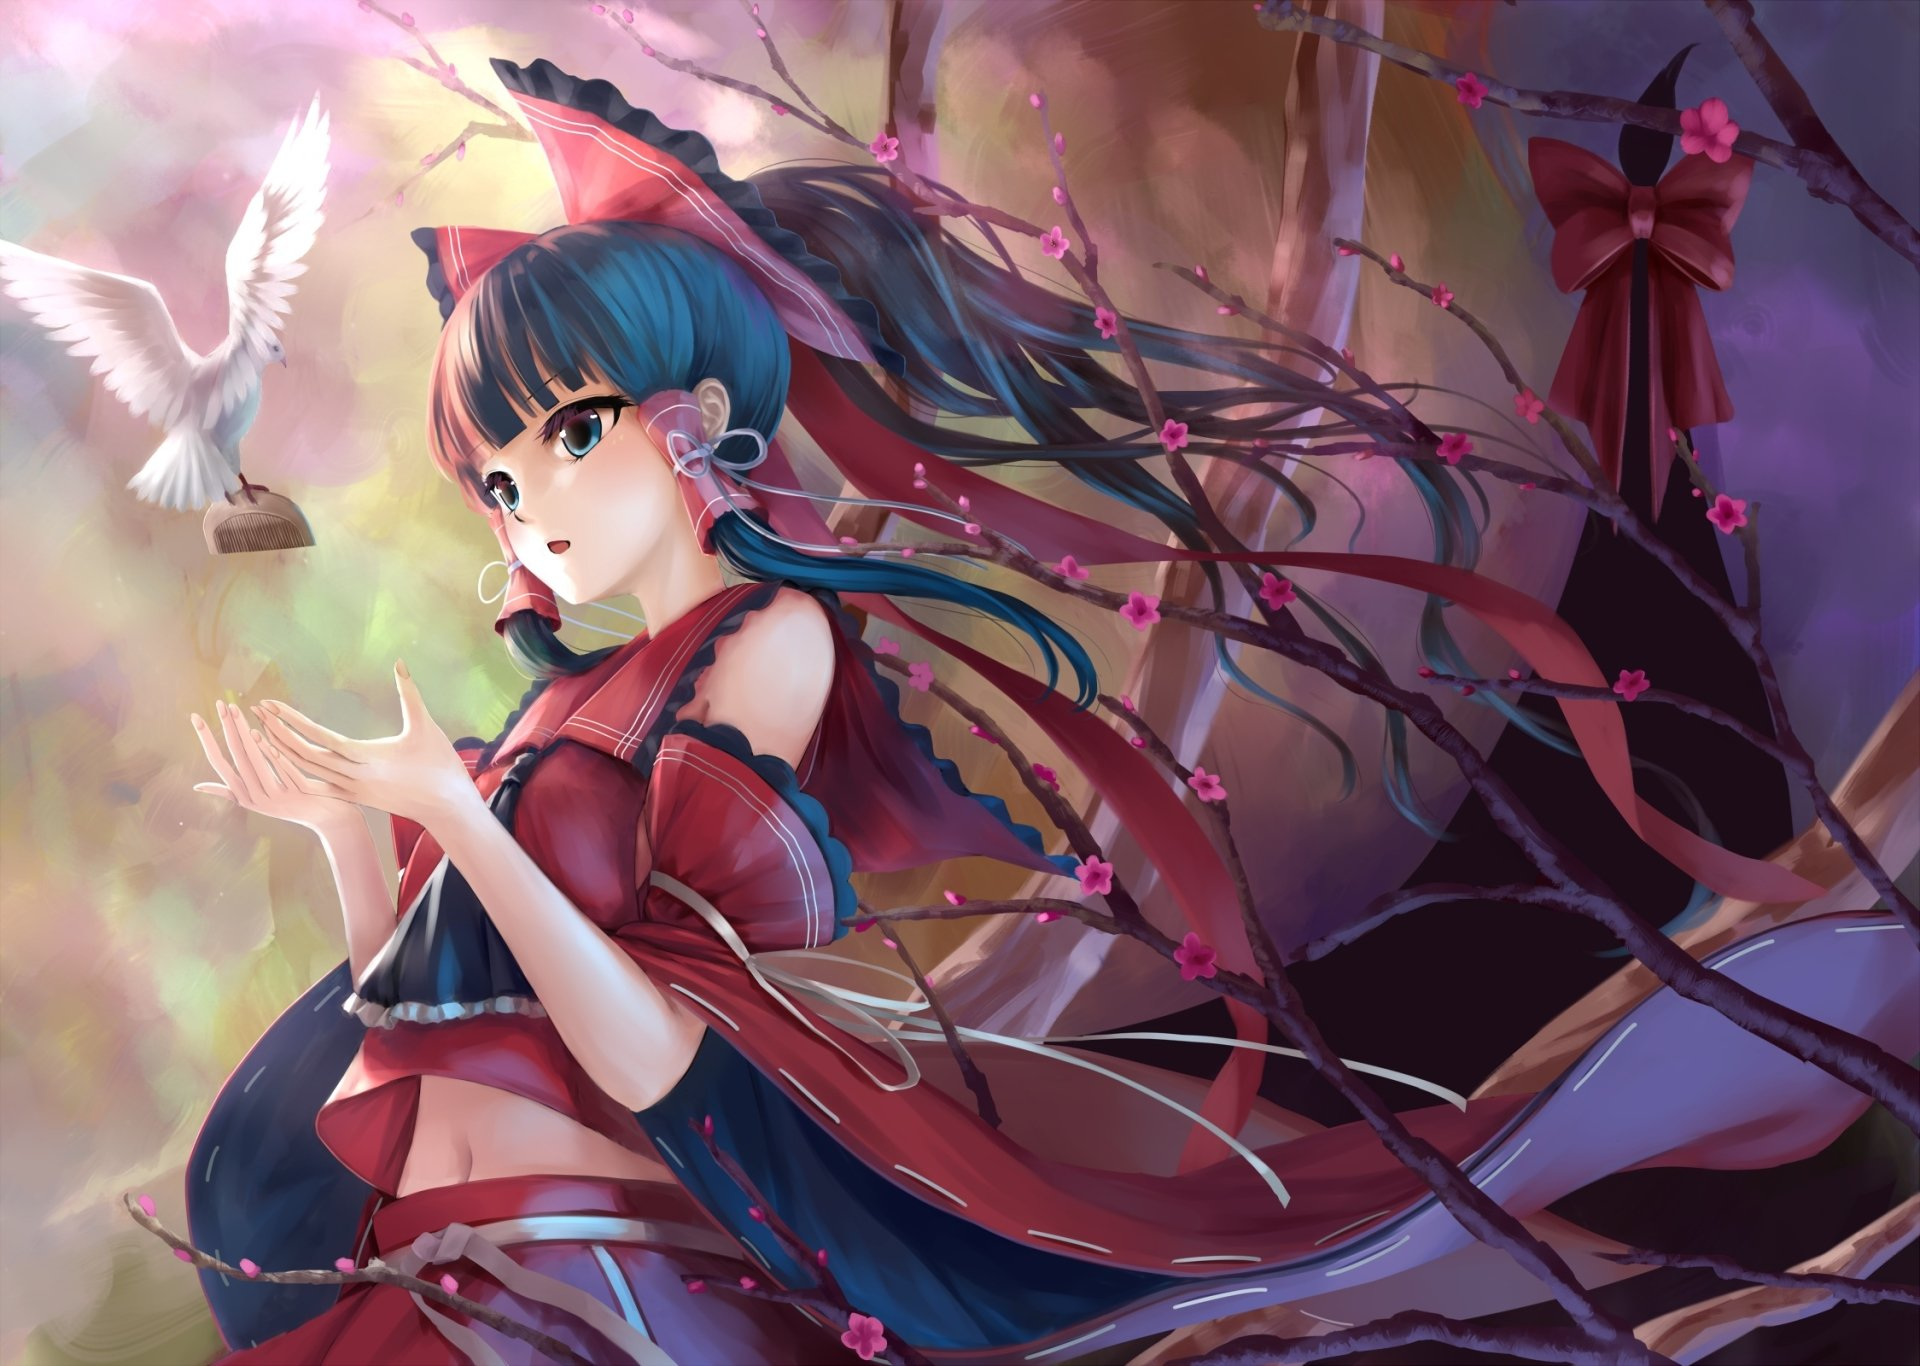 Anime - Touhou  Reimu Hakurei Wallpaper